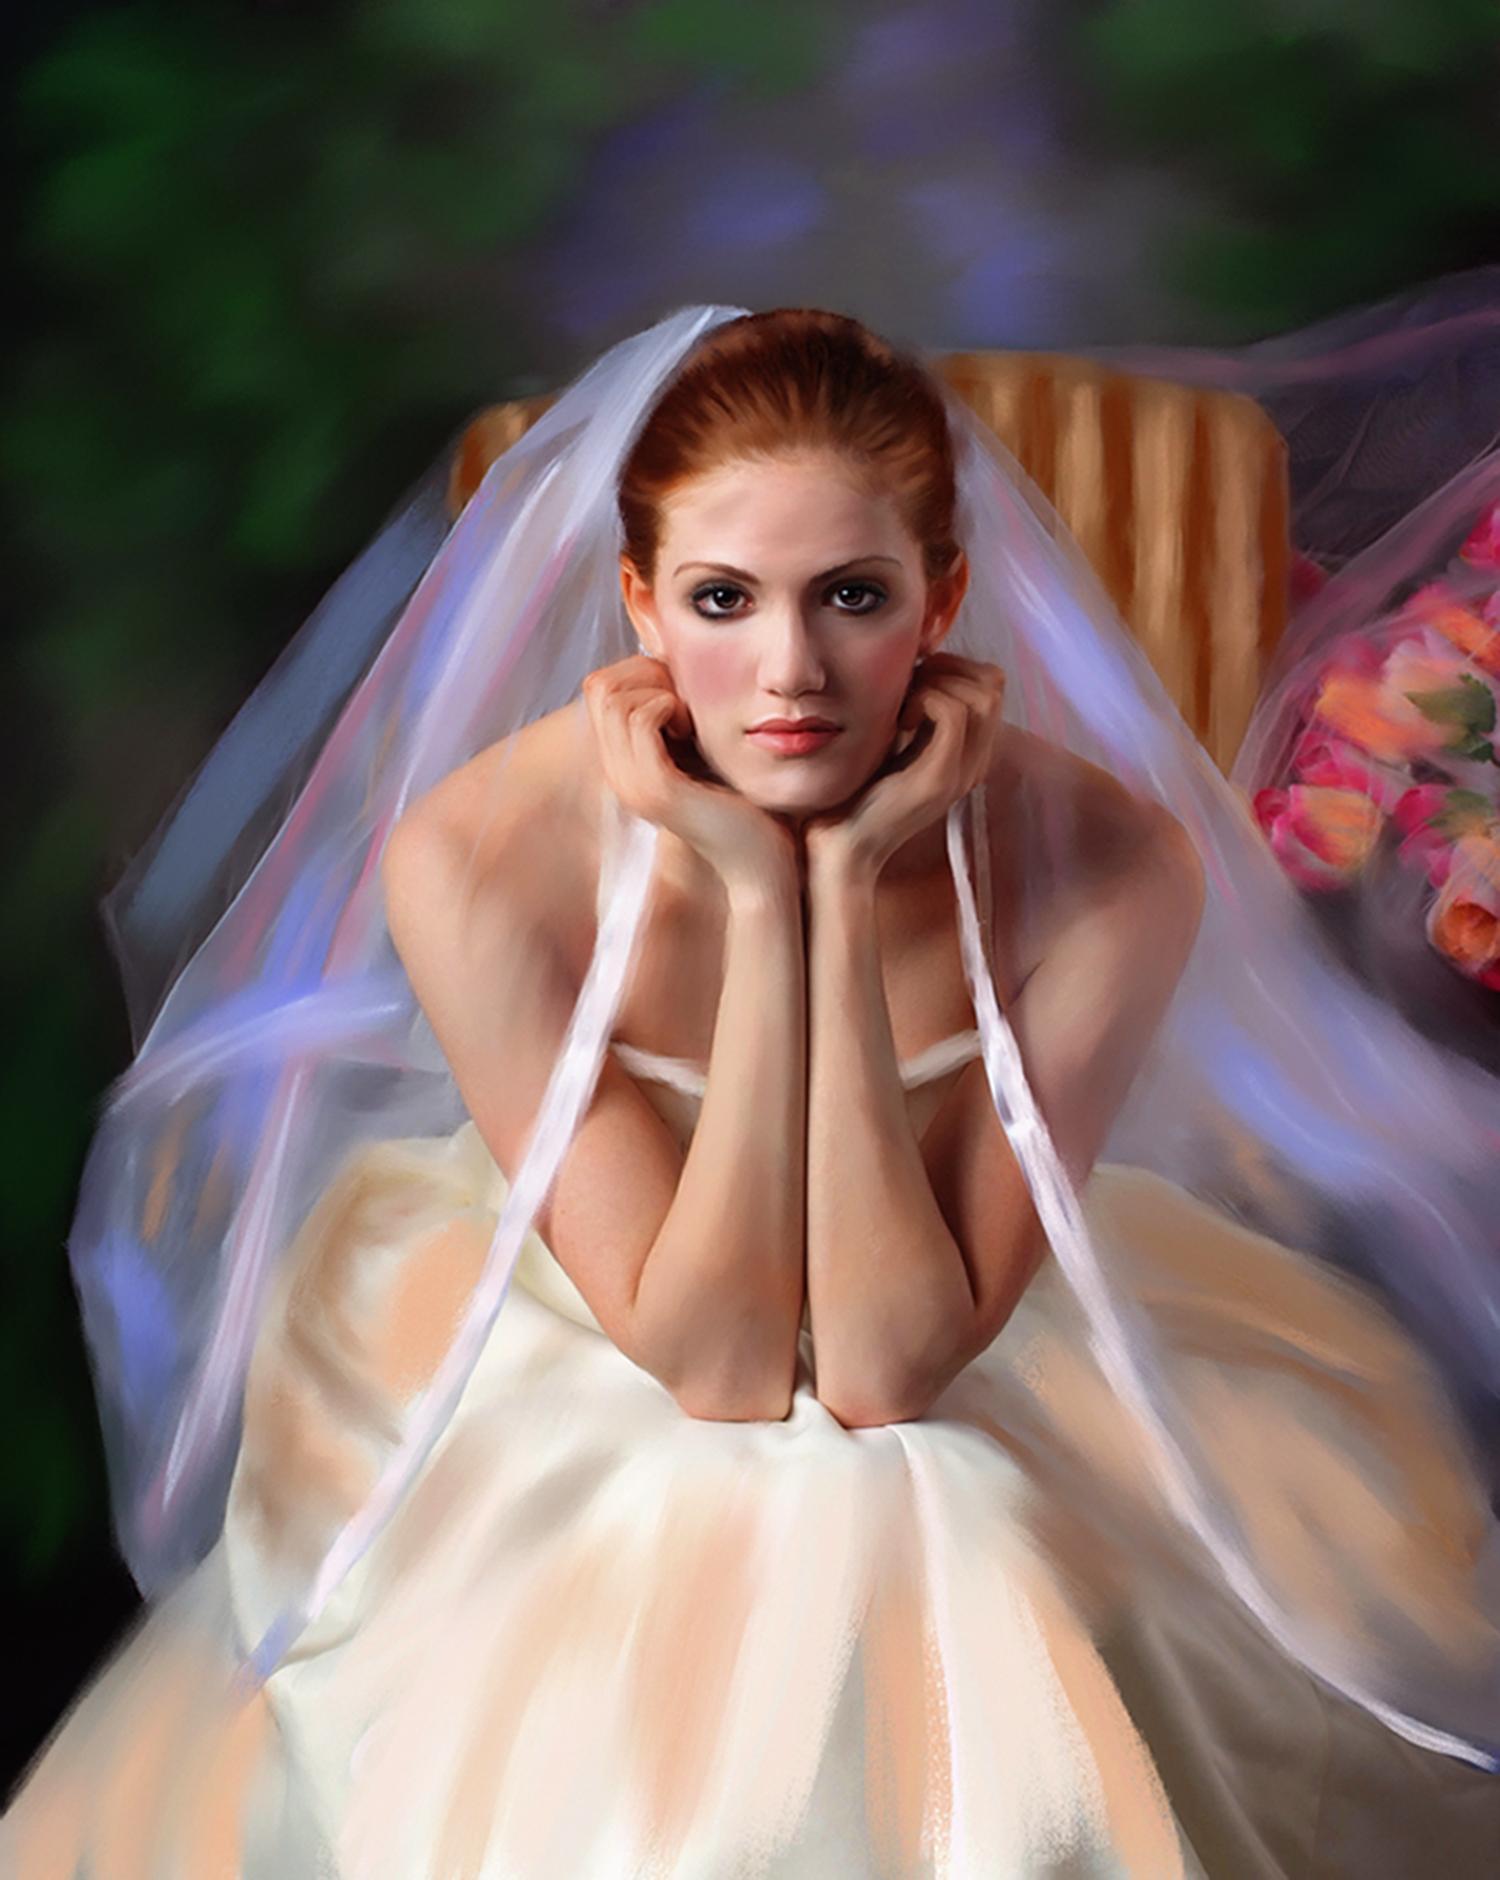 Rick-Ferro-Bridal-Painter-Portrait.jpg